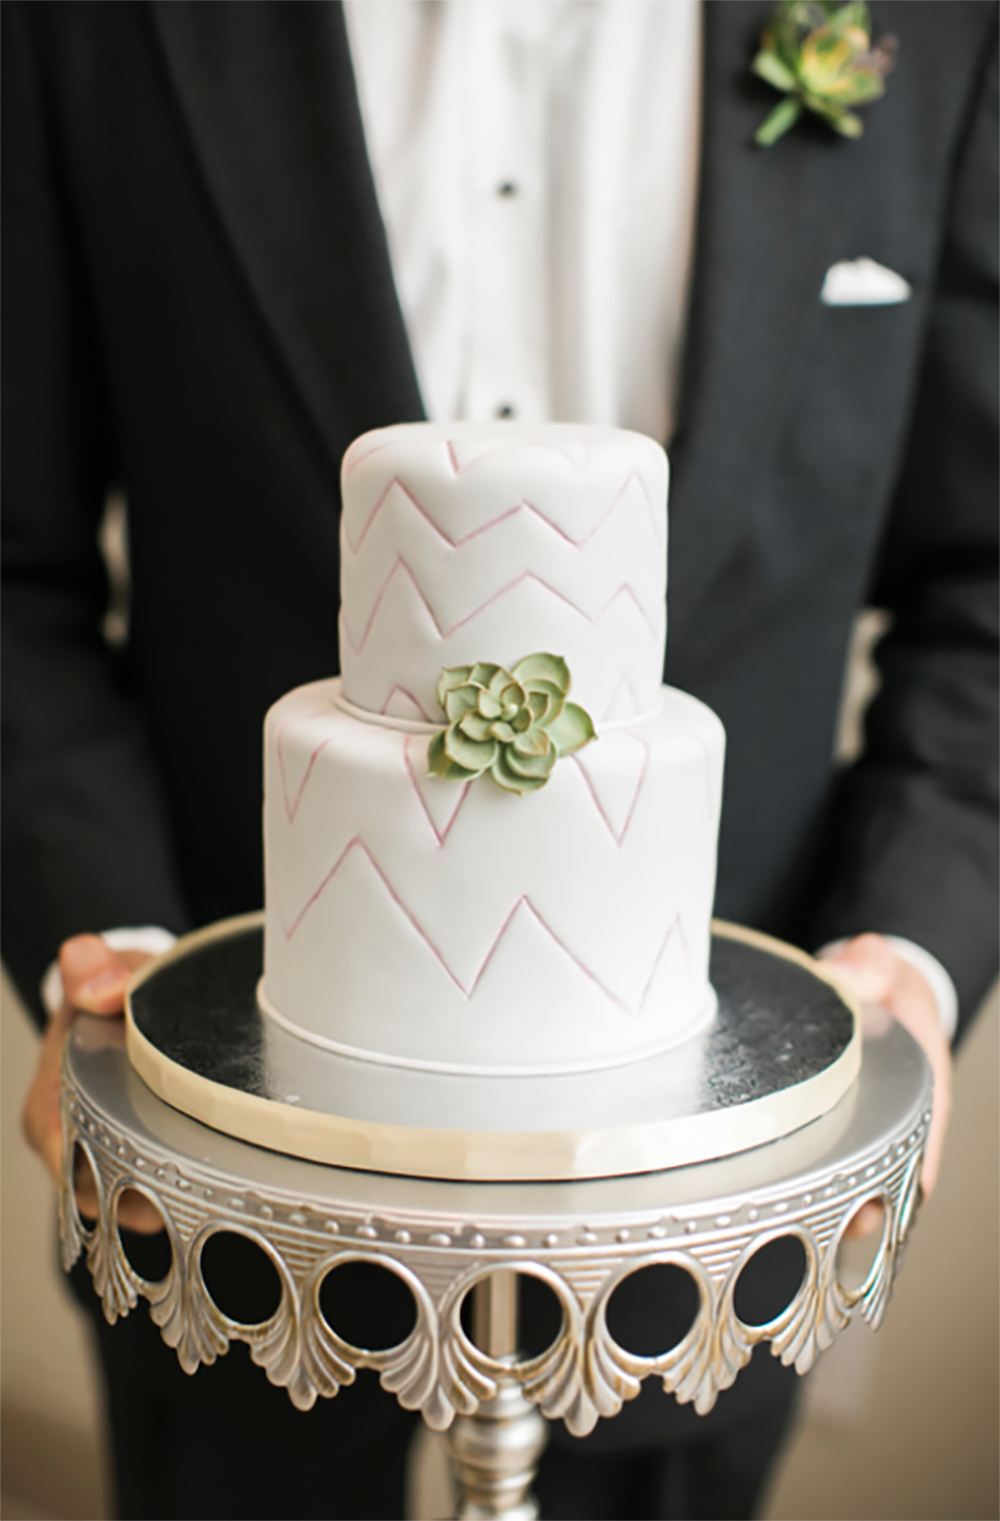 Opulent-Treasures-crown-cake-stand-silver-groom.png